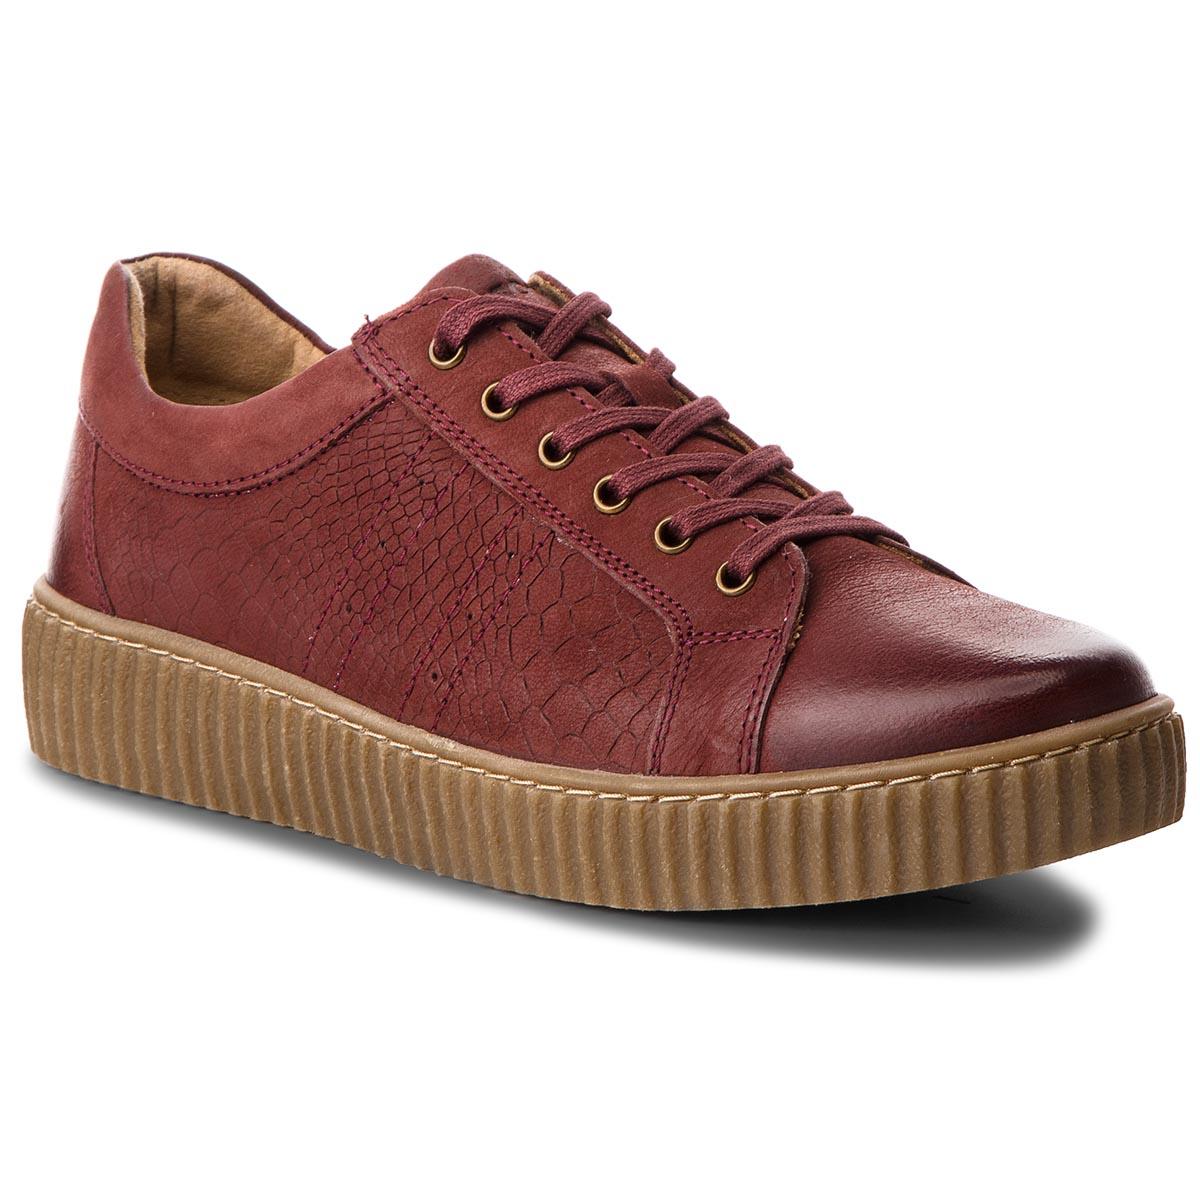 0f1c8c2a8d Sneakers VAGABOND - Ashley W 4646-040-38 Wine - Sneakers - Low shoes ...